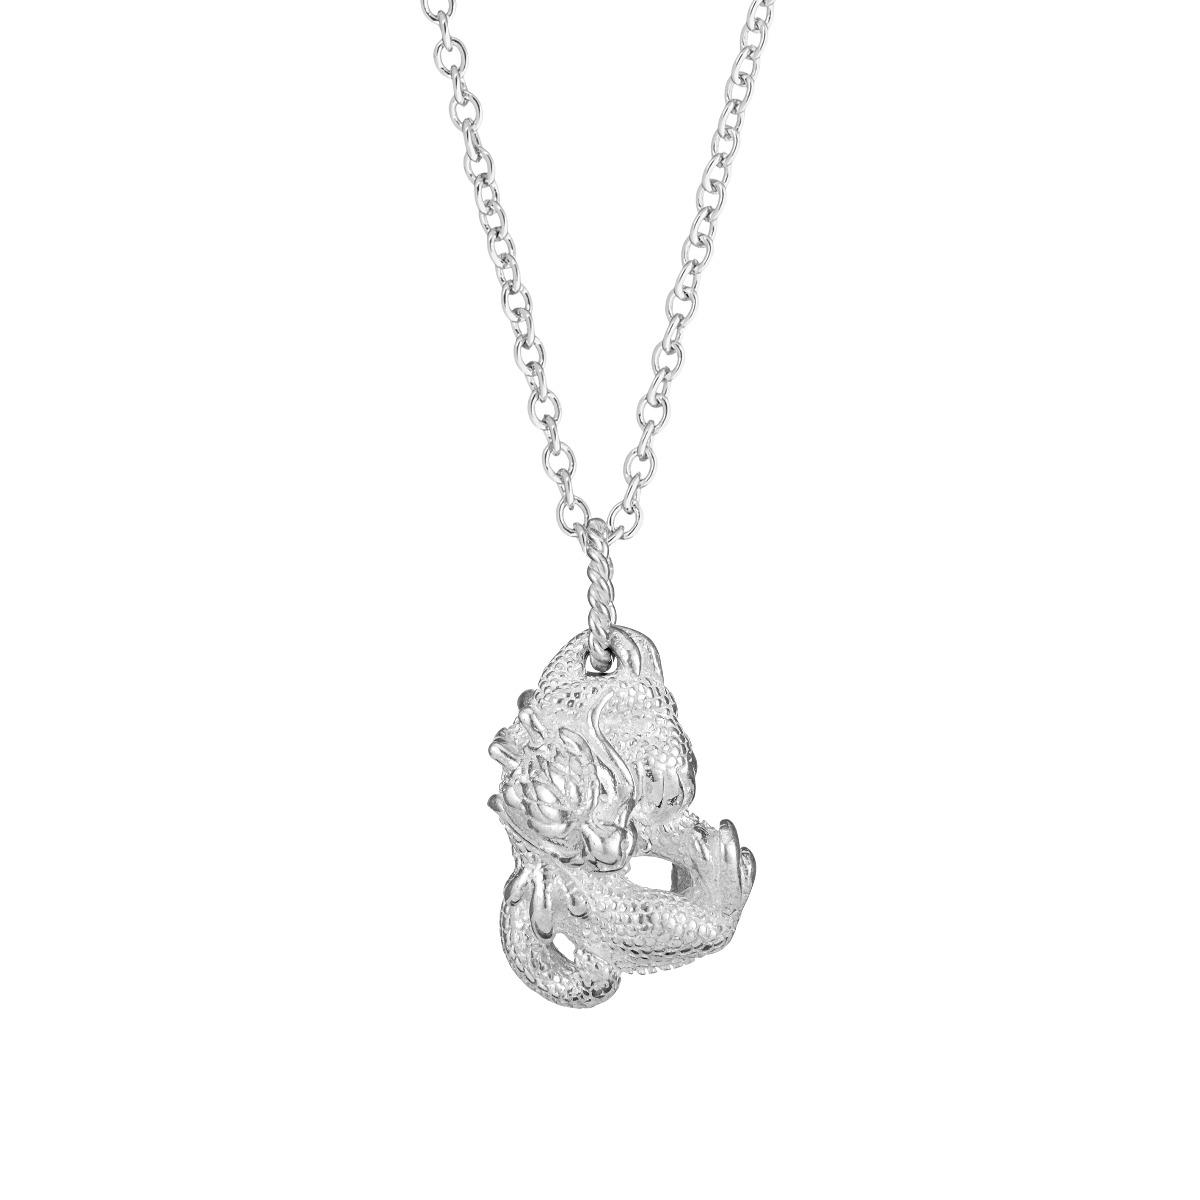 Chinese zodiac pendant necklace (dragon)